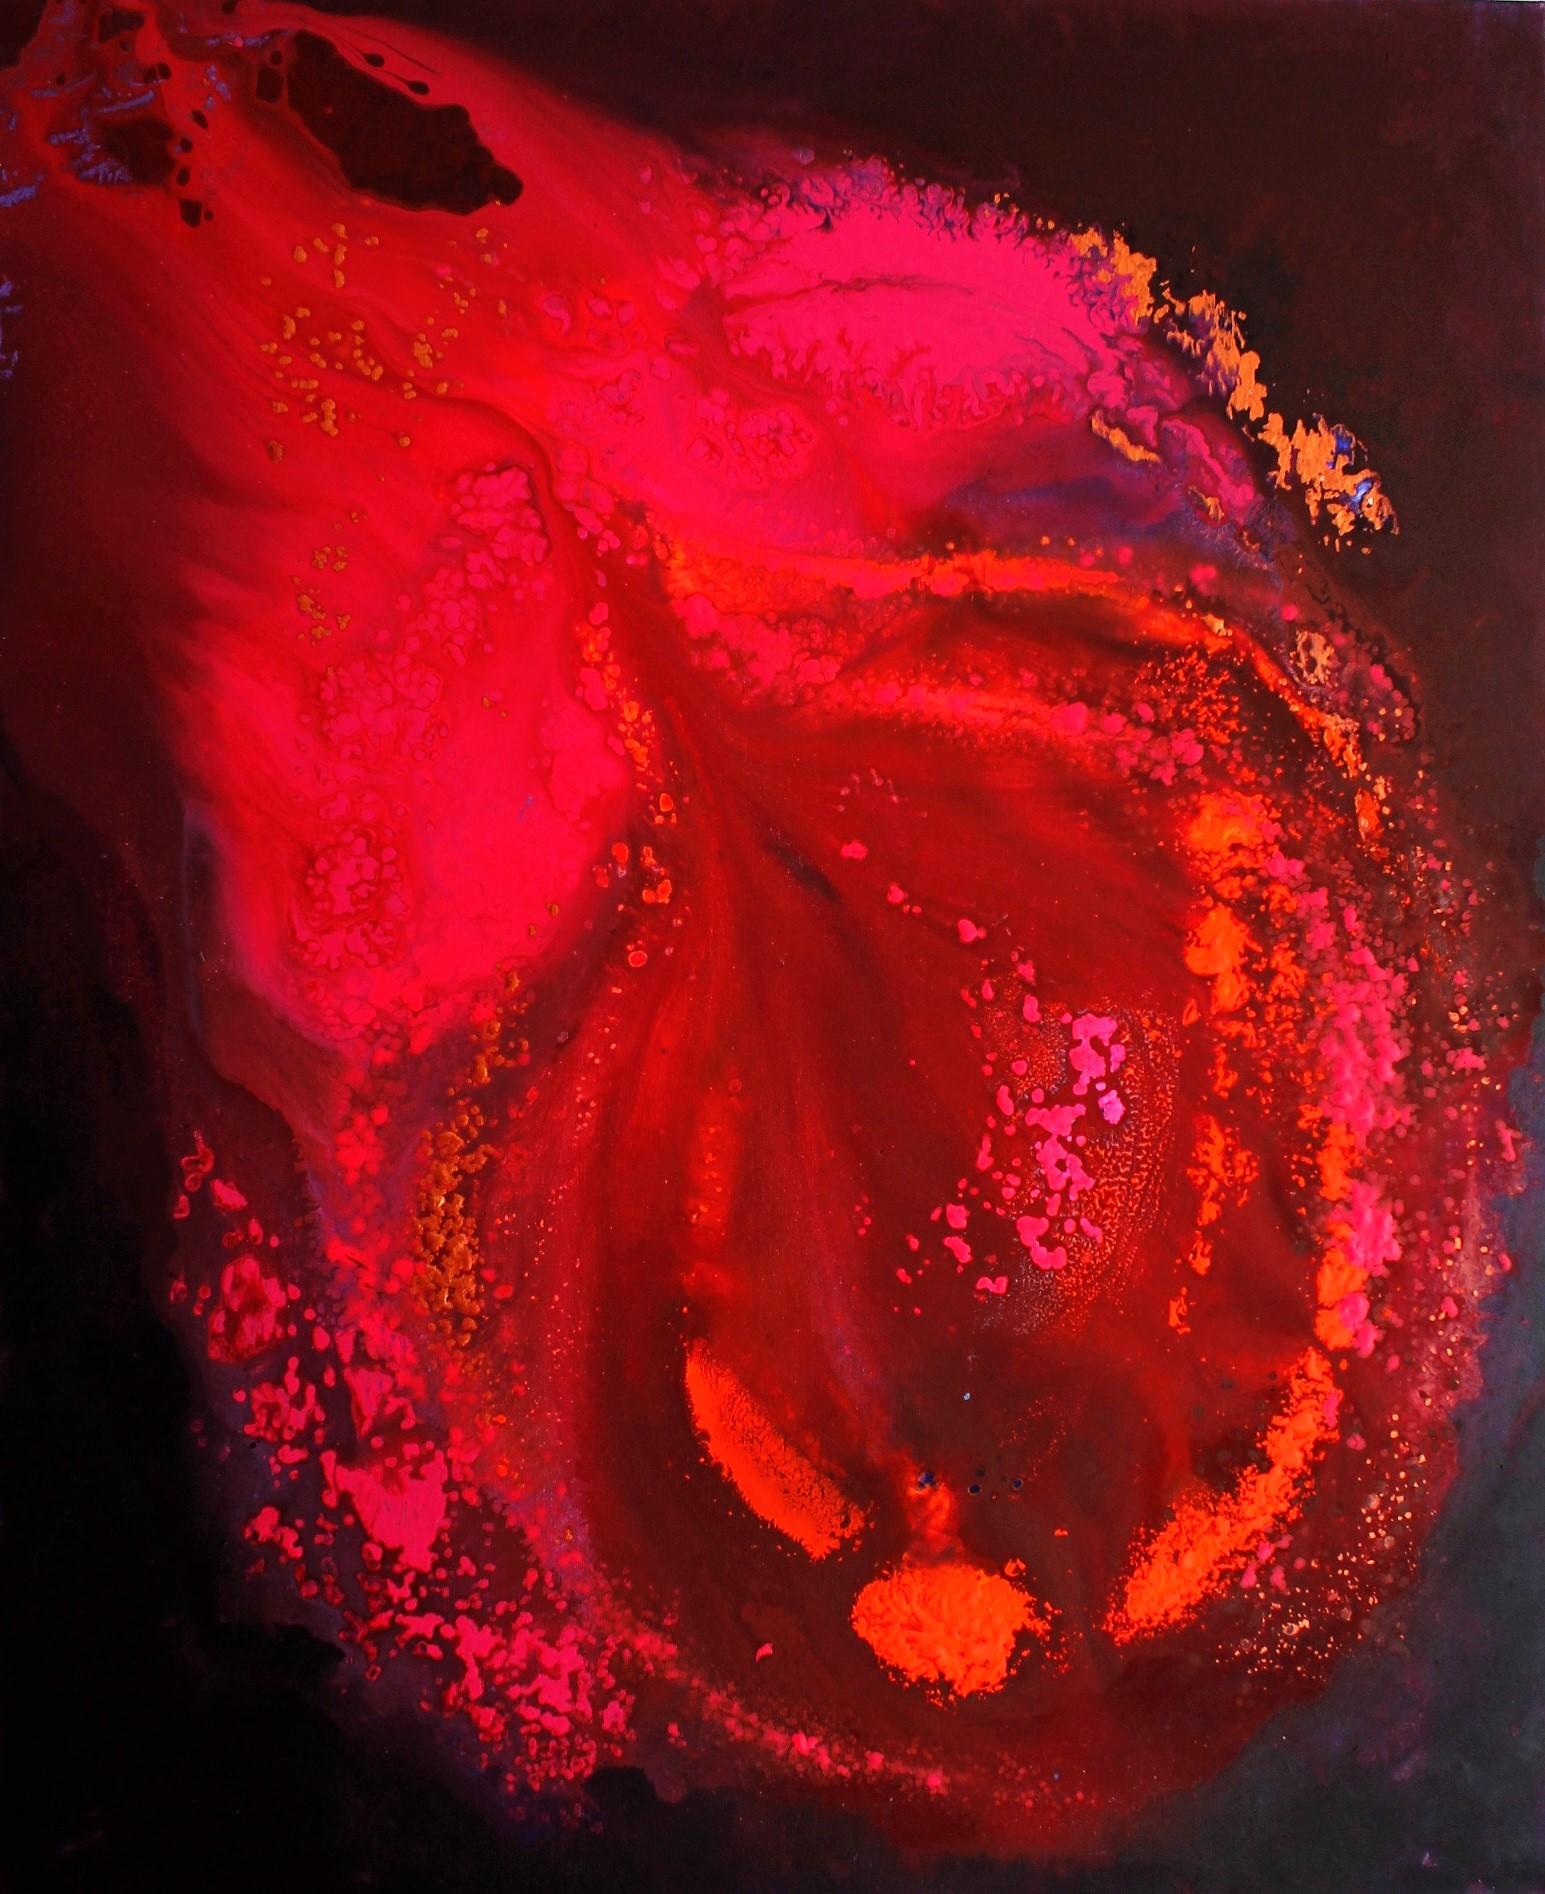 Hekuma, Akryyli kankaalle, 100 cm x 80 cm  Myyty / Sold